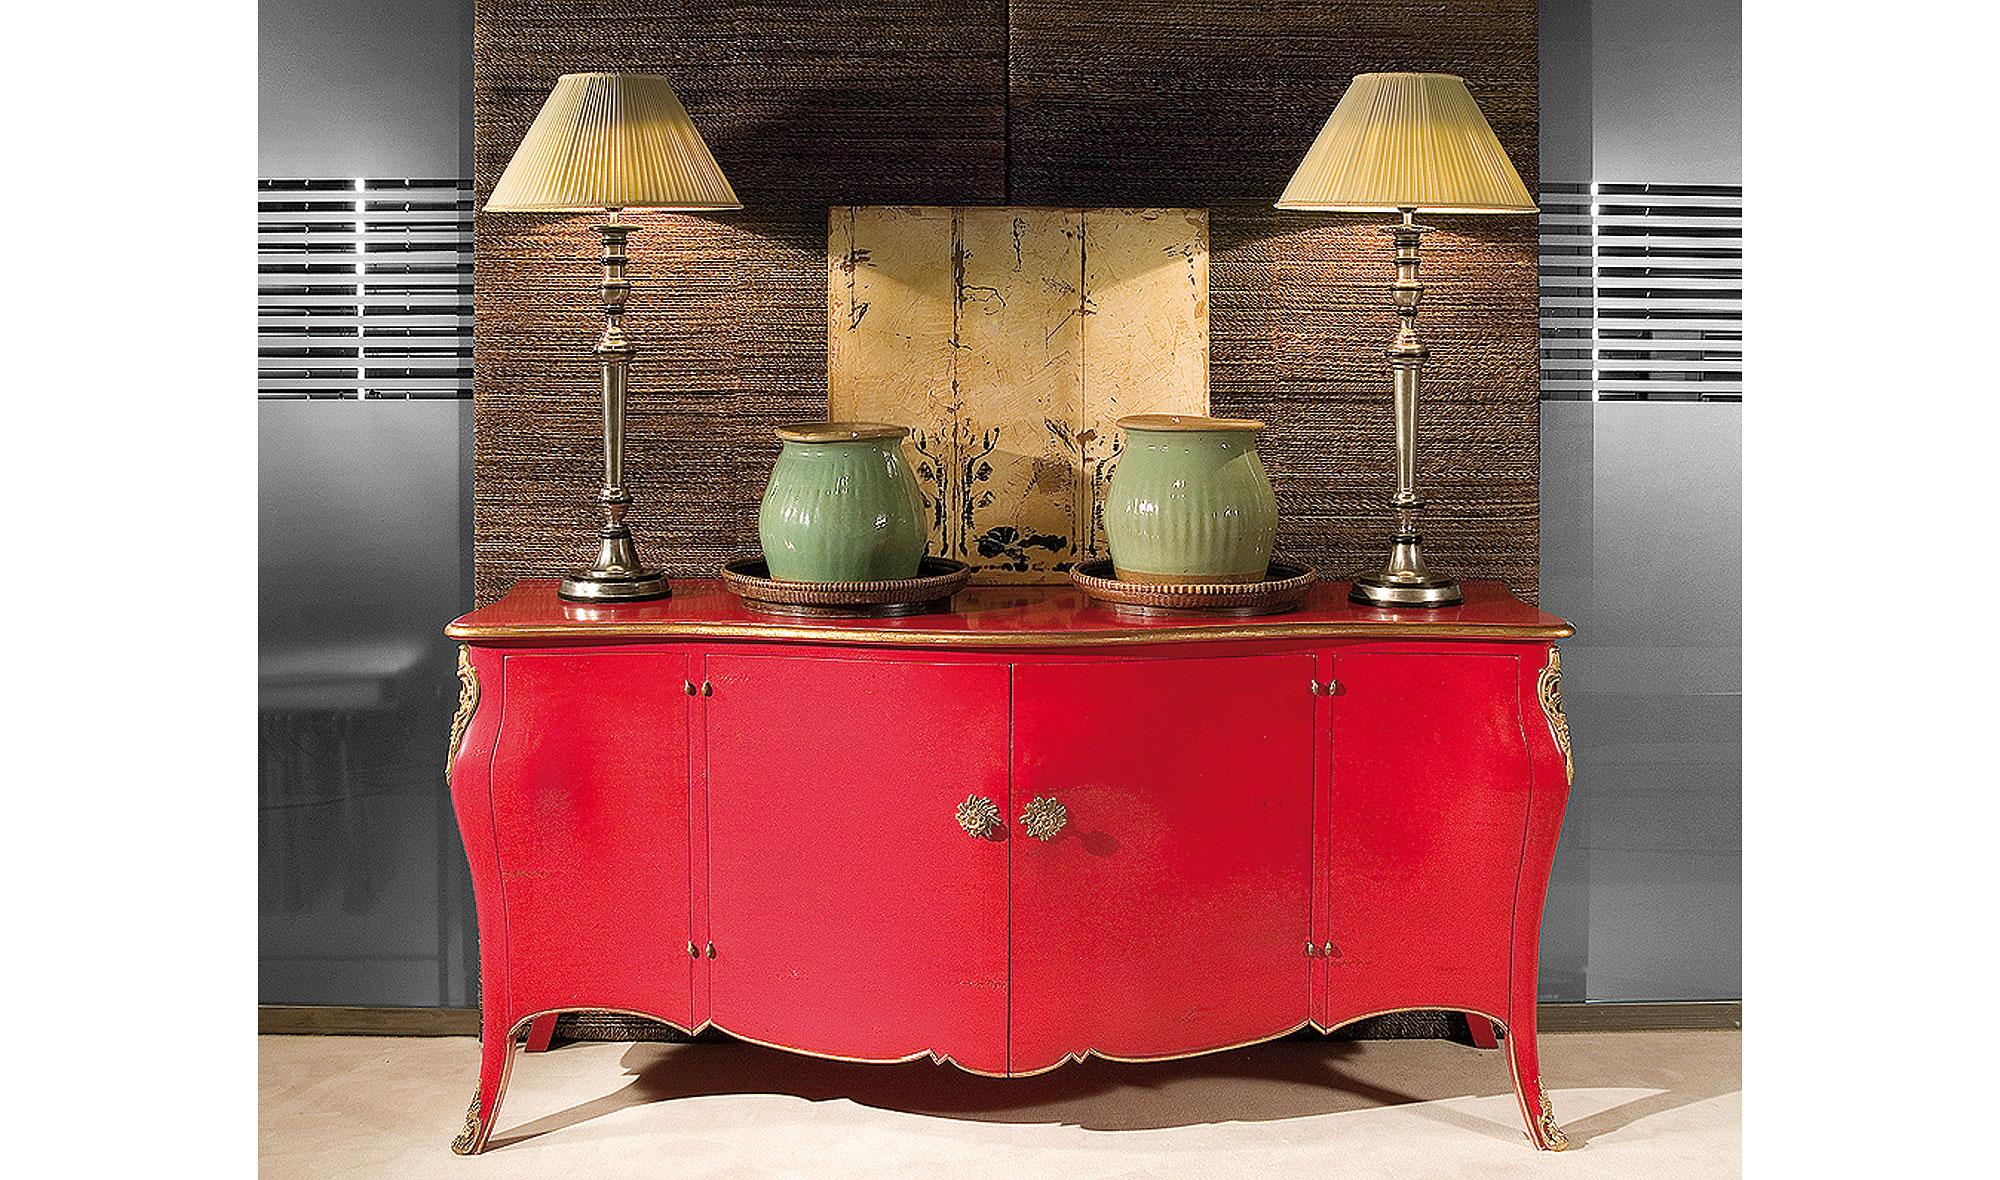 Aparador Vintage Regence Rojo en Portobellostreetes